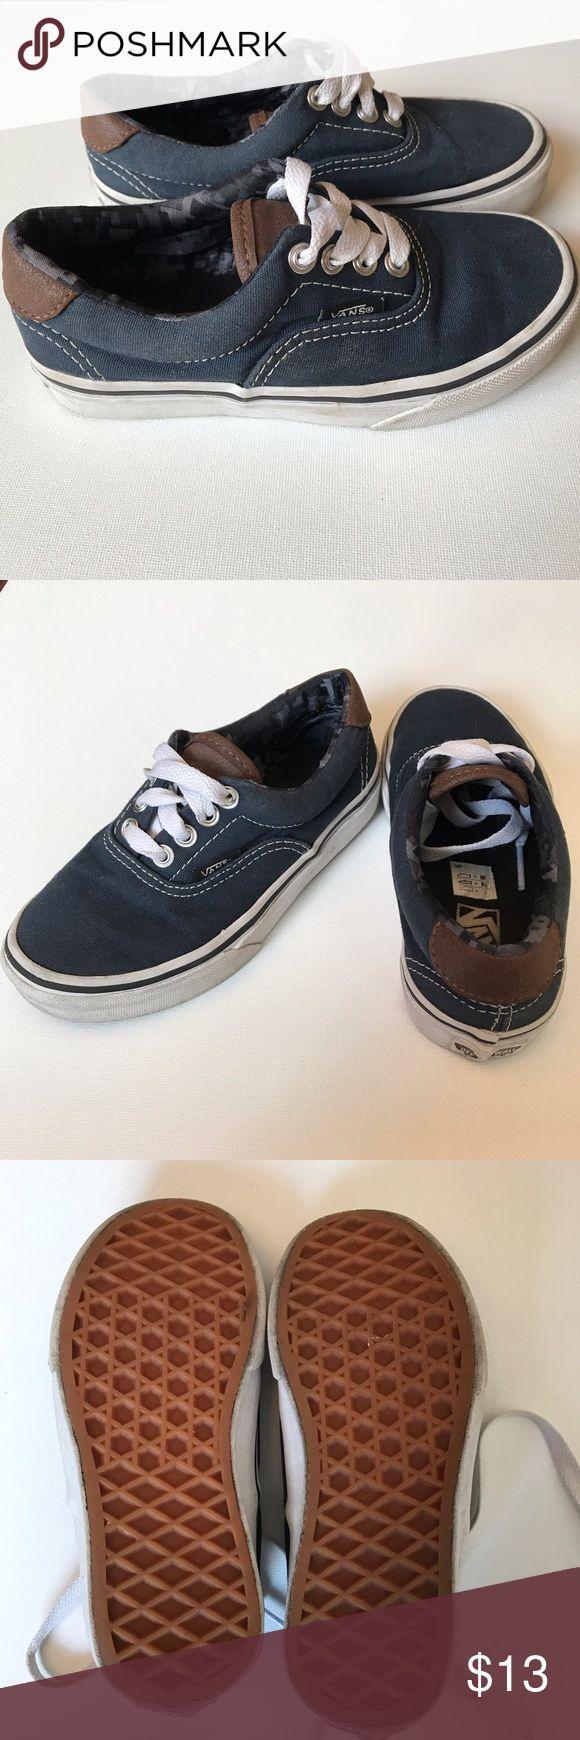 Navy Vans Used Navy Vans sneaker w/ brown leather tongue and detail on heel. Wear shown in pictures. Vans Shoes Sneakers